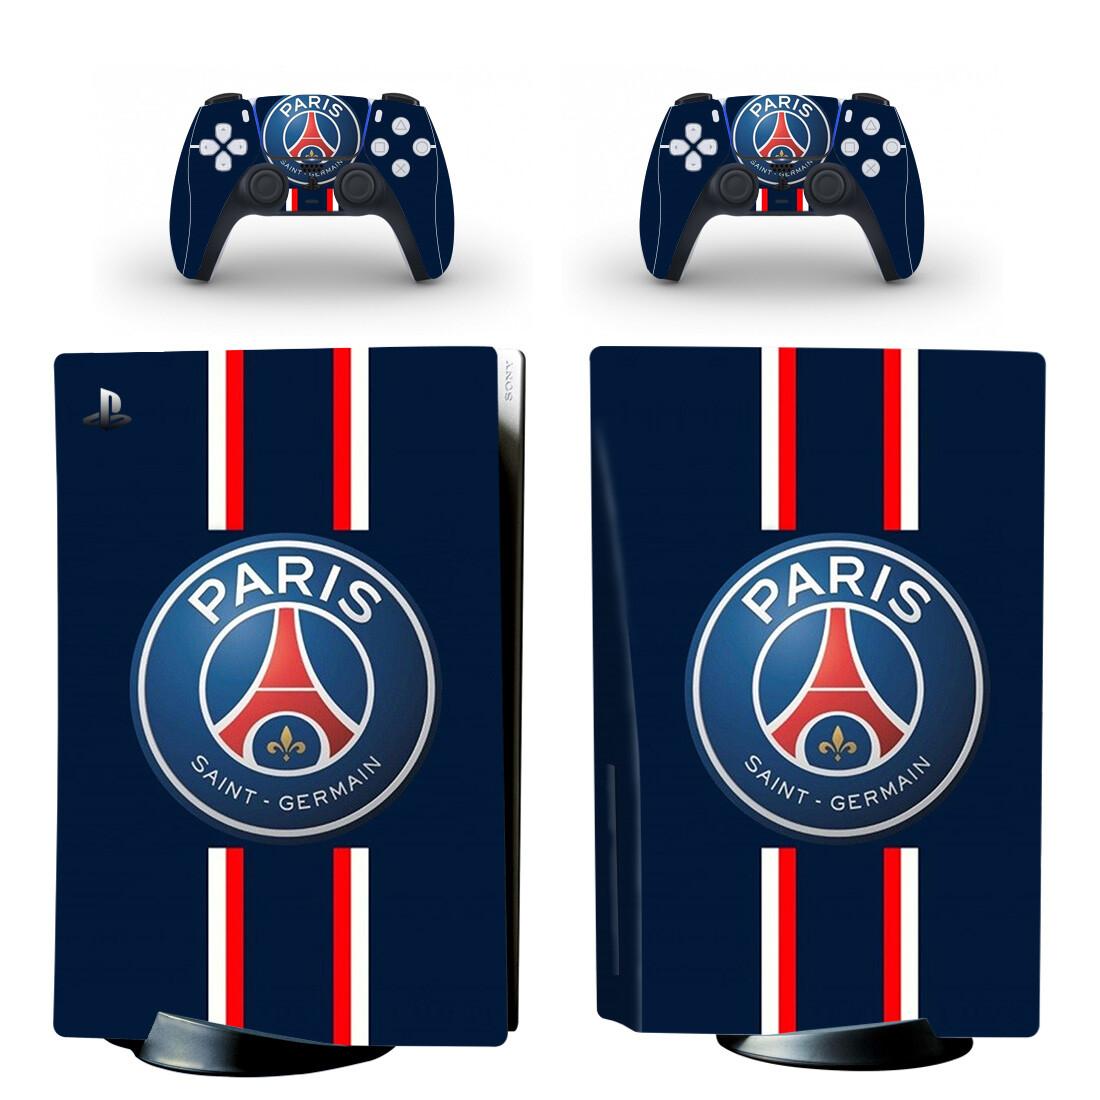 Paris Saint-Germain F.C PS5 Skin Sticker Decal Design 2